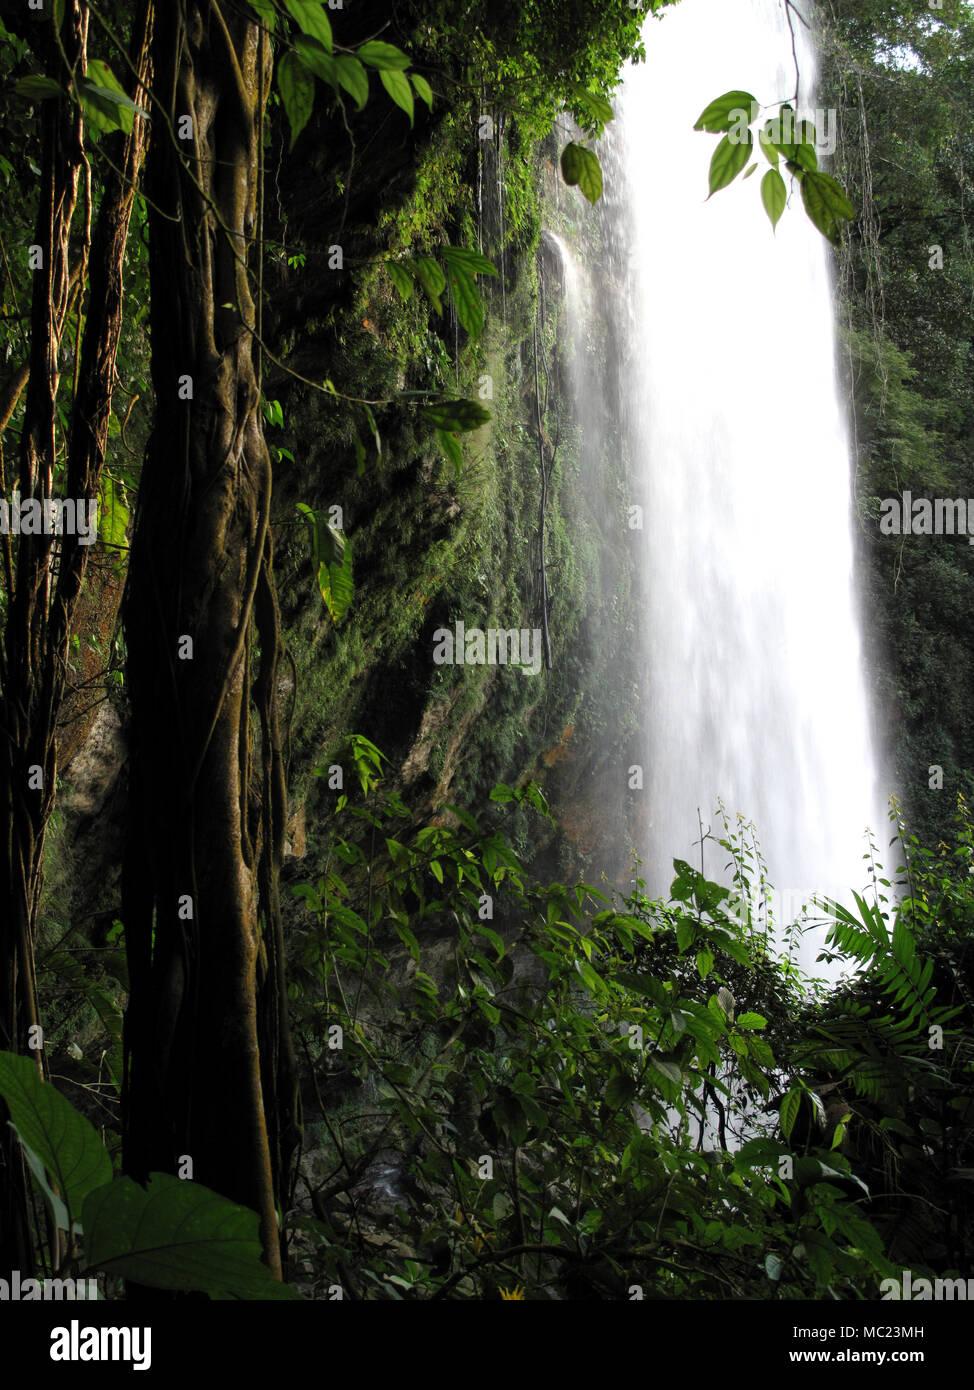 Lianas grow at the Misol Ha waterfall in Salto de Agua, Chiapas, Mexico, February 19, 2010. - Stock Image